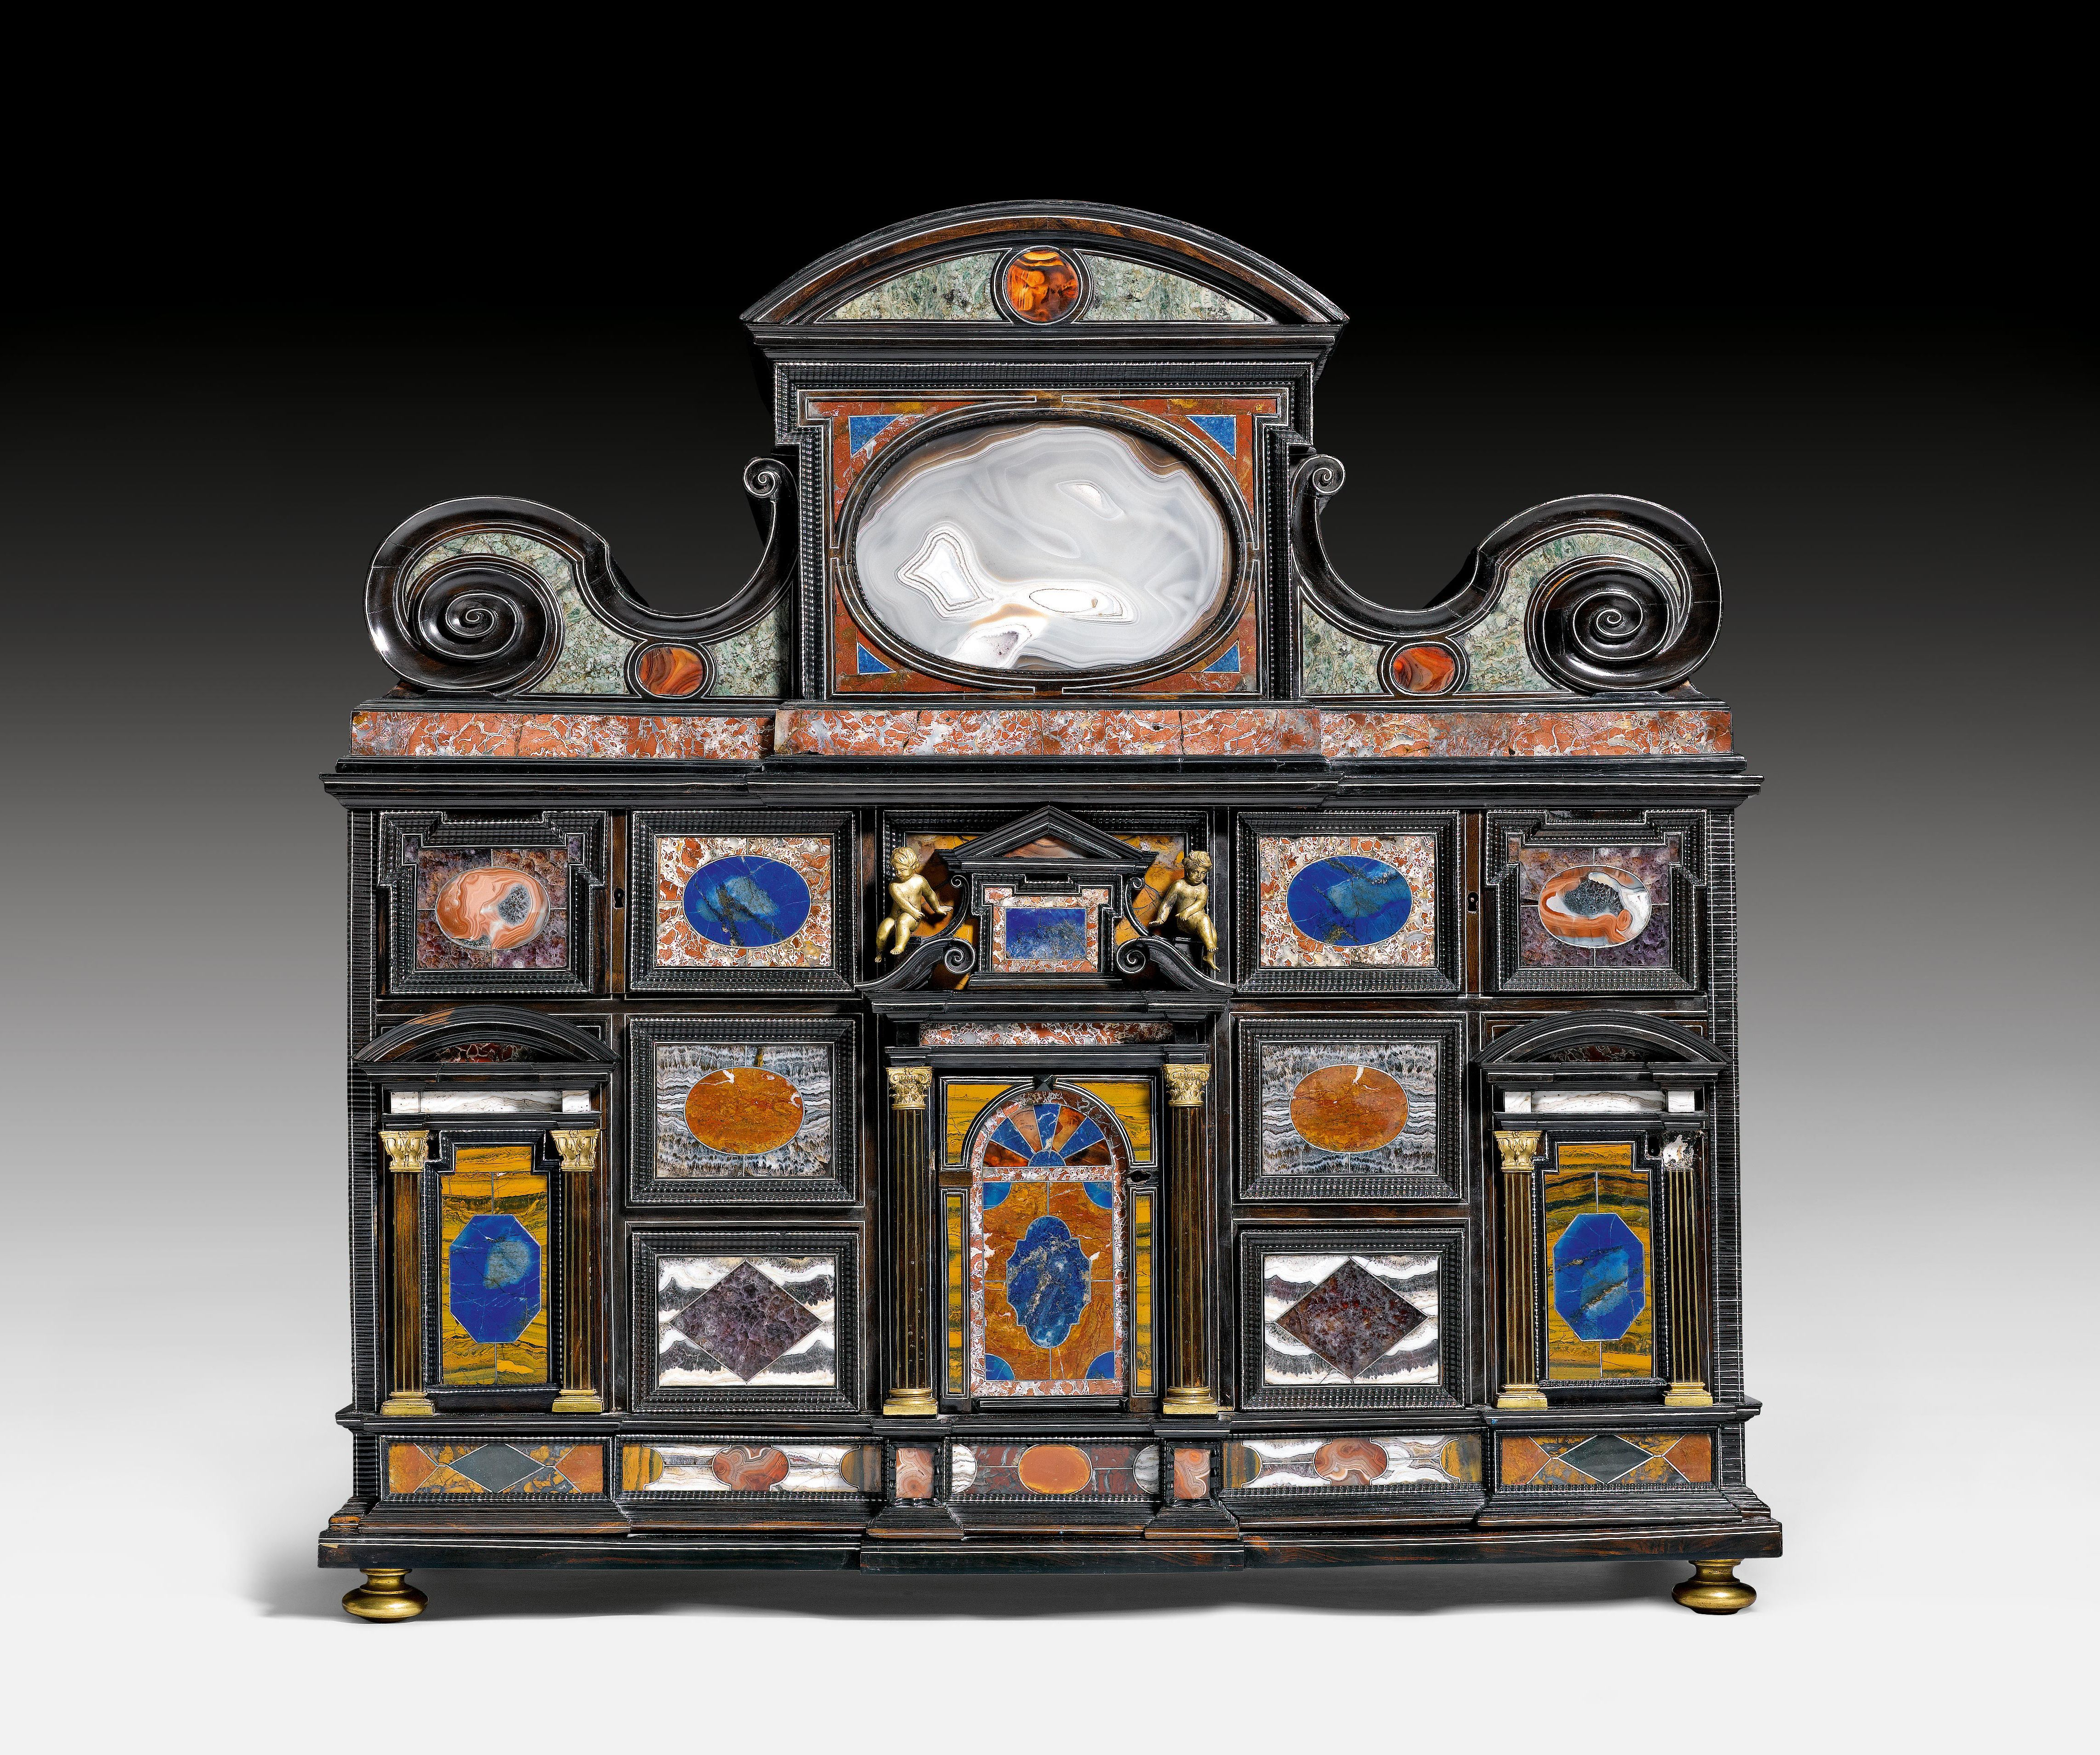 """PIETRA PAESINA""-KABINETT,    Renaissance, eine Schublade bez. und dat. AD DEN 8 TAG DEZEMBER 1636 - JO TOBIAS TAIS FECIT. C..TO STUTIOL, Florenz, 17. Jh koller_l_1.jpg (4564×3814)"